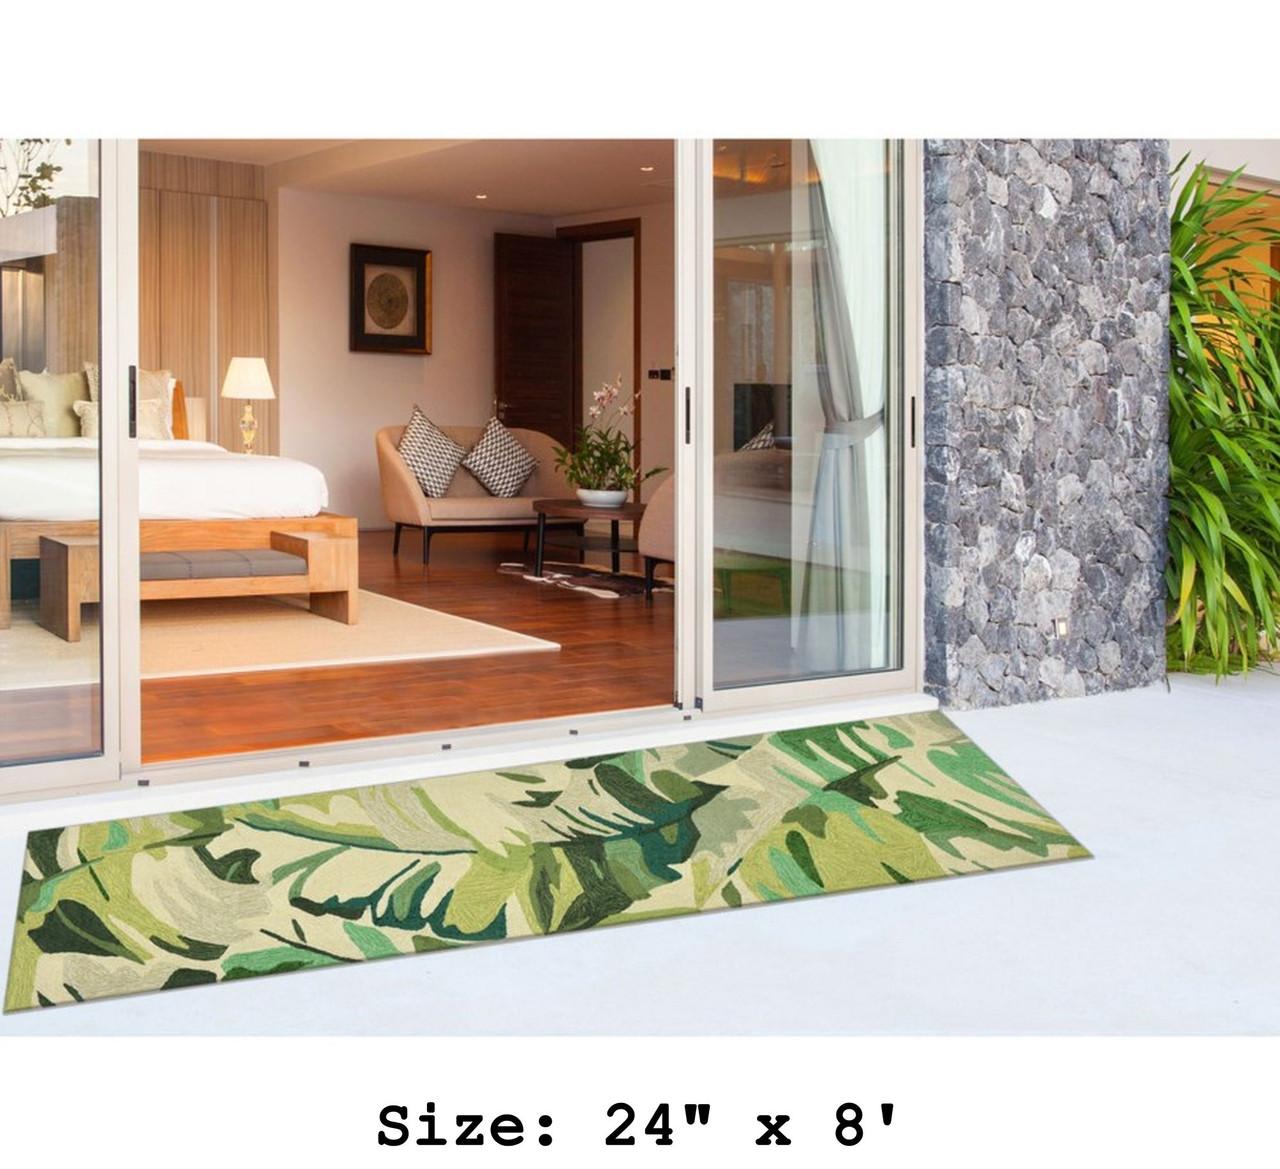 Green Capri Palm Leaf Indoor/Outdoor Rug - Runner Lifestyle